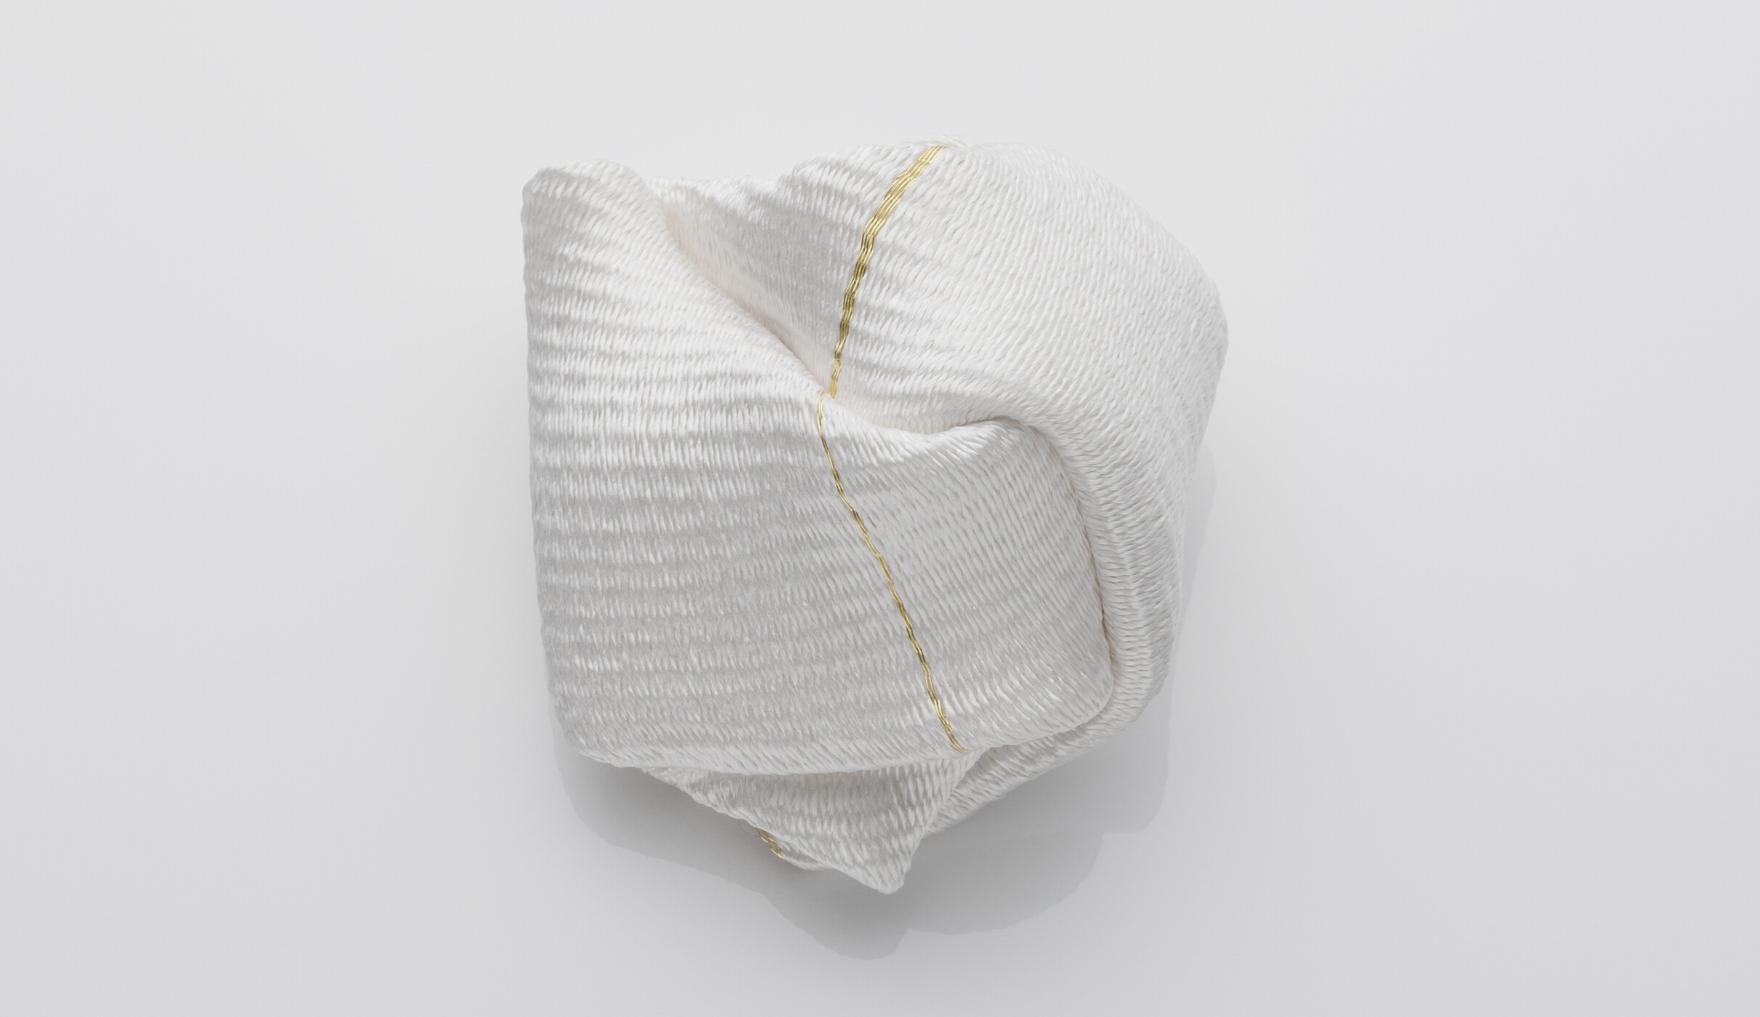 Kazumi Nagano, White brooch, wearable art, Thereza Pedrosa gallery, Asolo